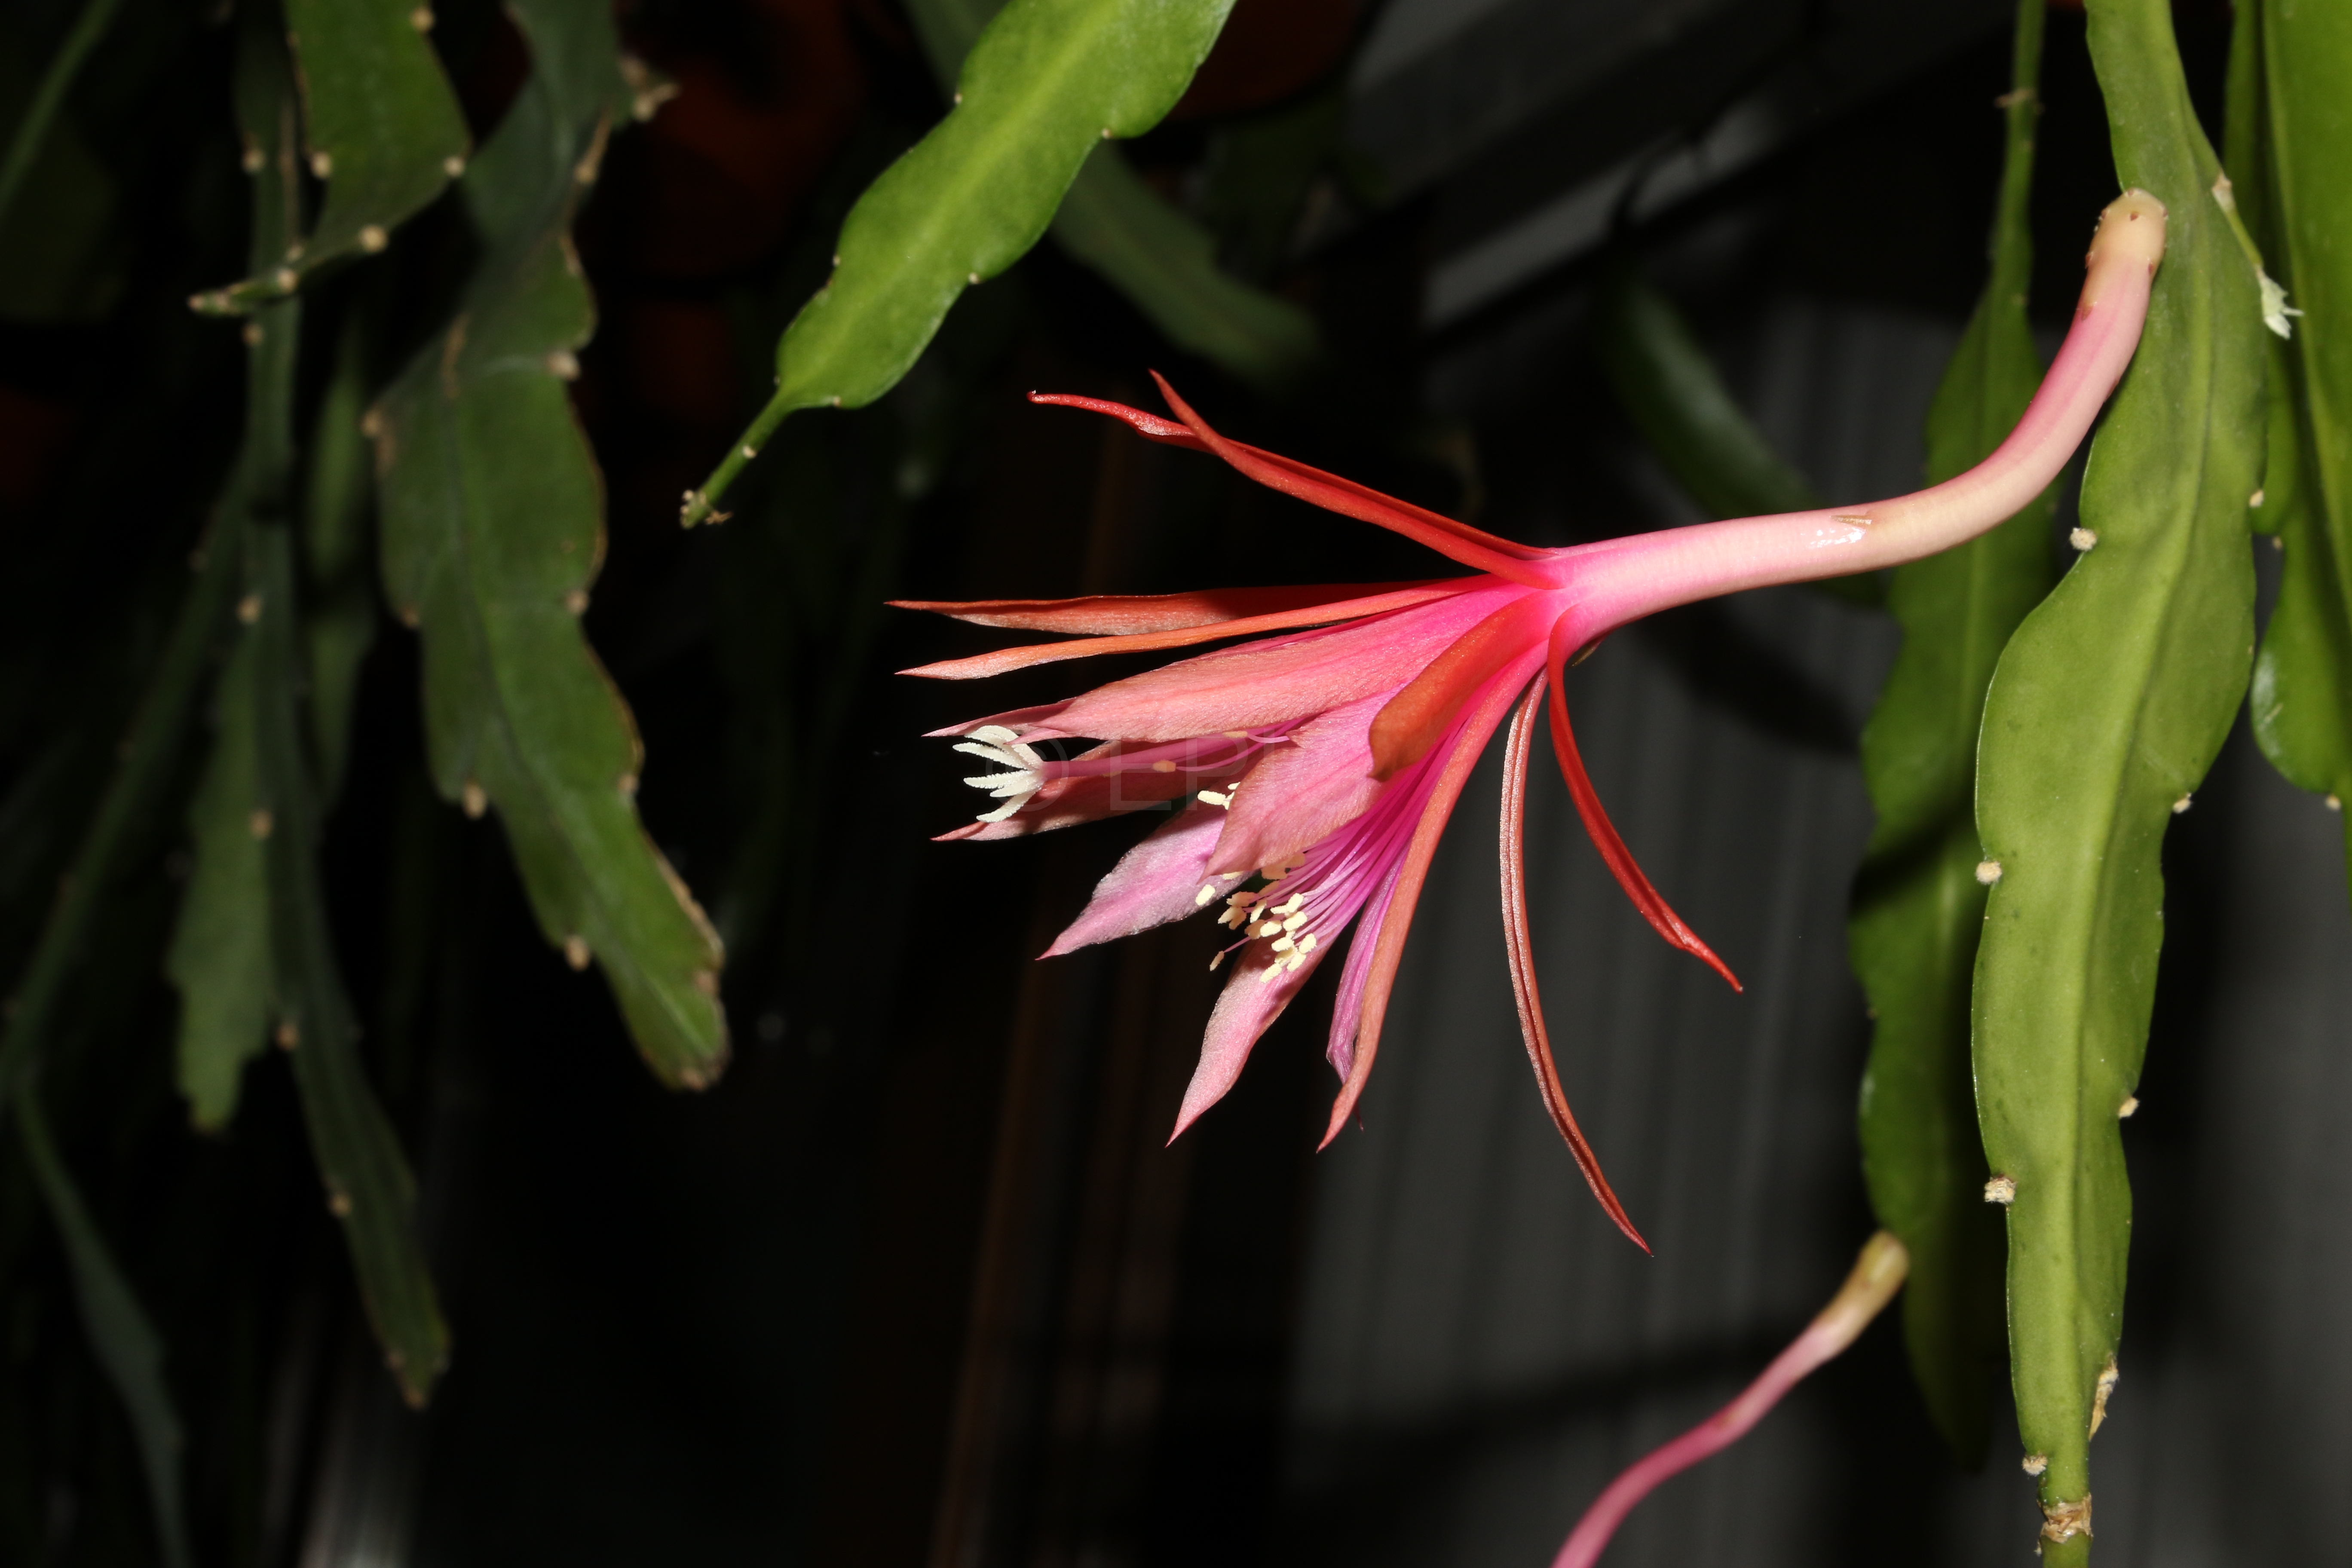 Epikaktus 'Jalisco Flirt' (Foto Walter Widmann)